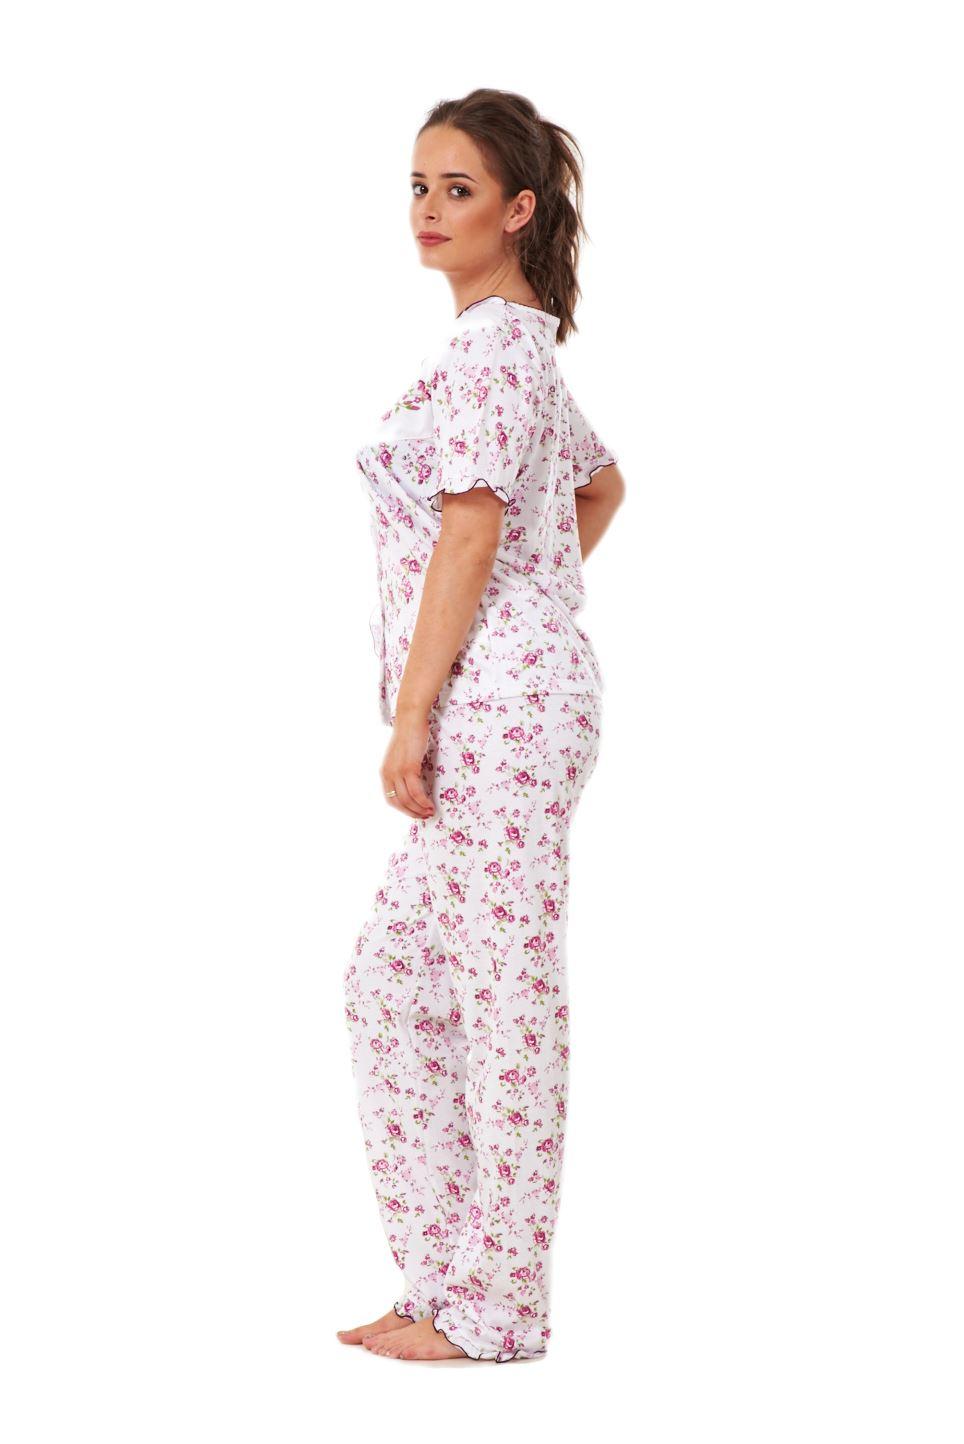 0cde584b62 Ladies Women Pyjama Sets Floral Cotton Short Sleeve Button Nightwear ...